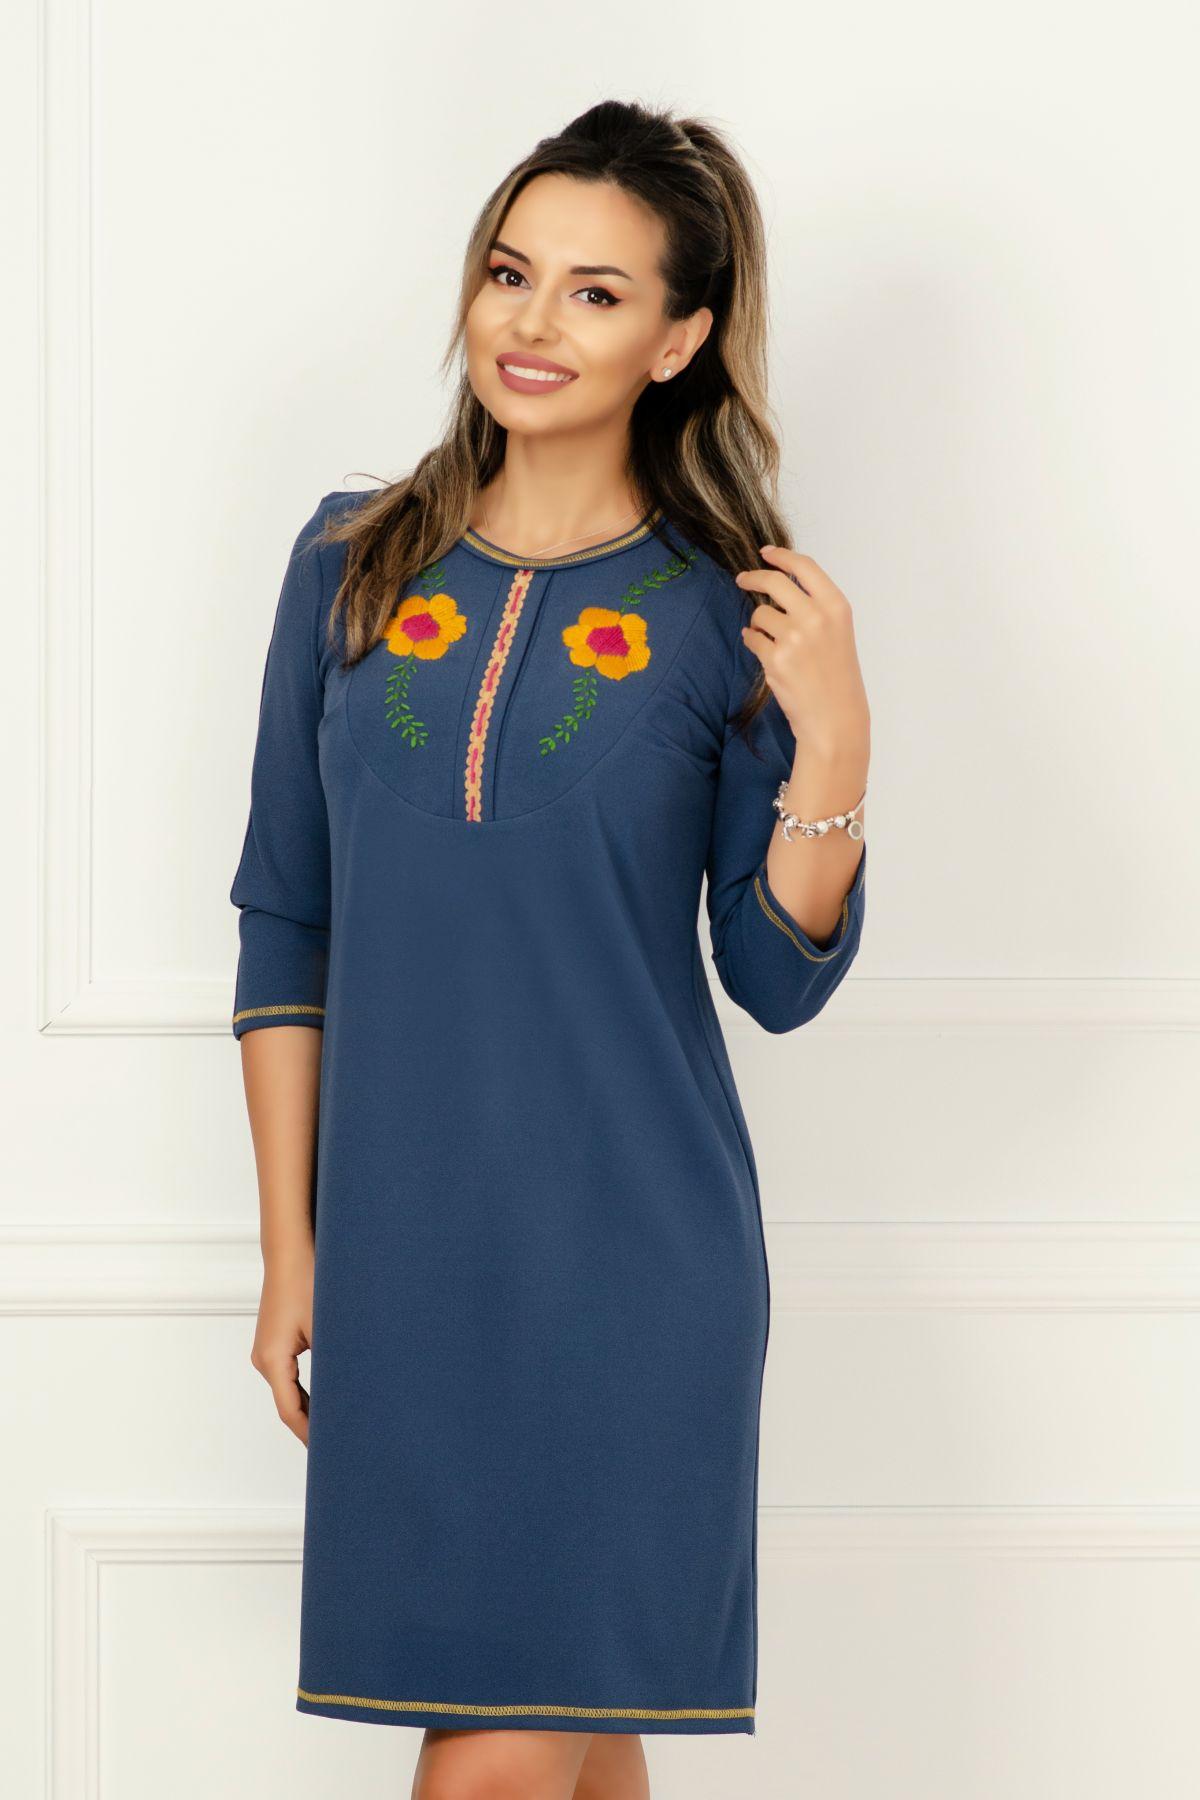 Rochie de zi albastra cu flori cusute Venezia-Artigiano-Moda